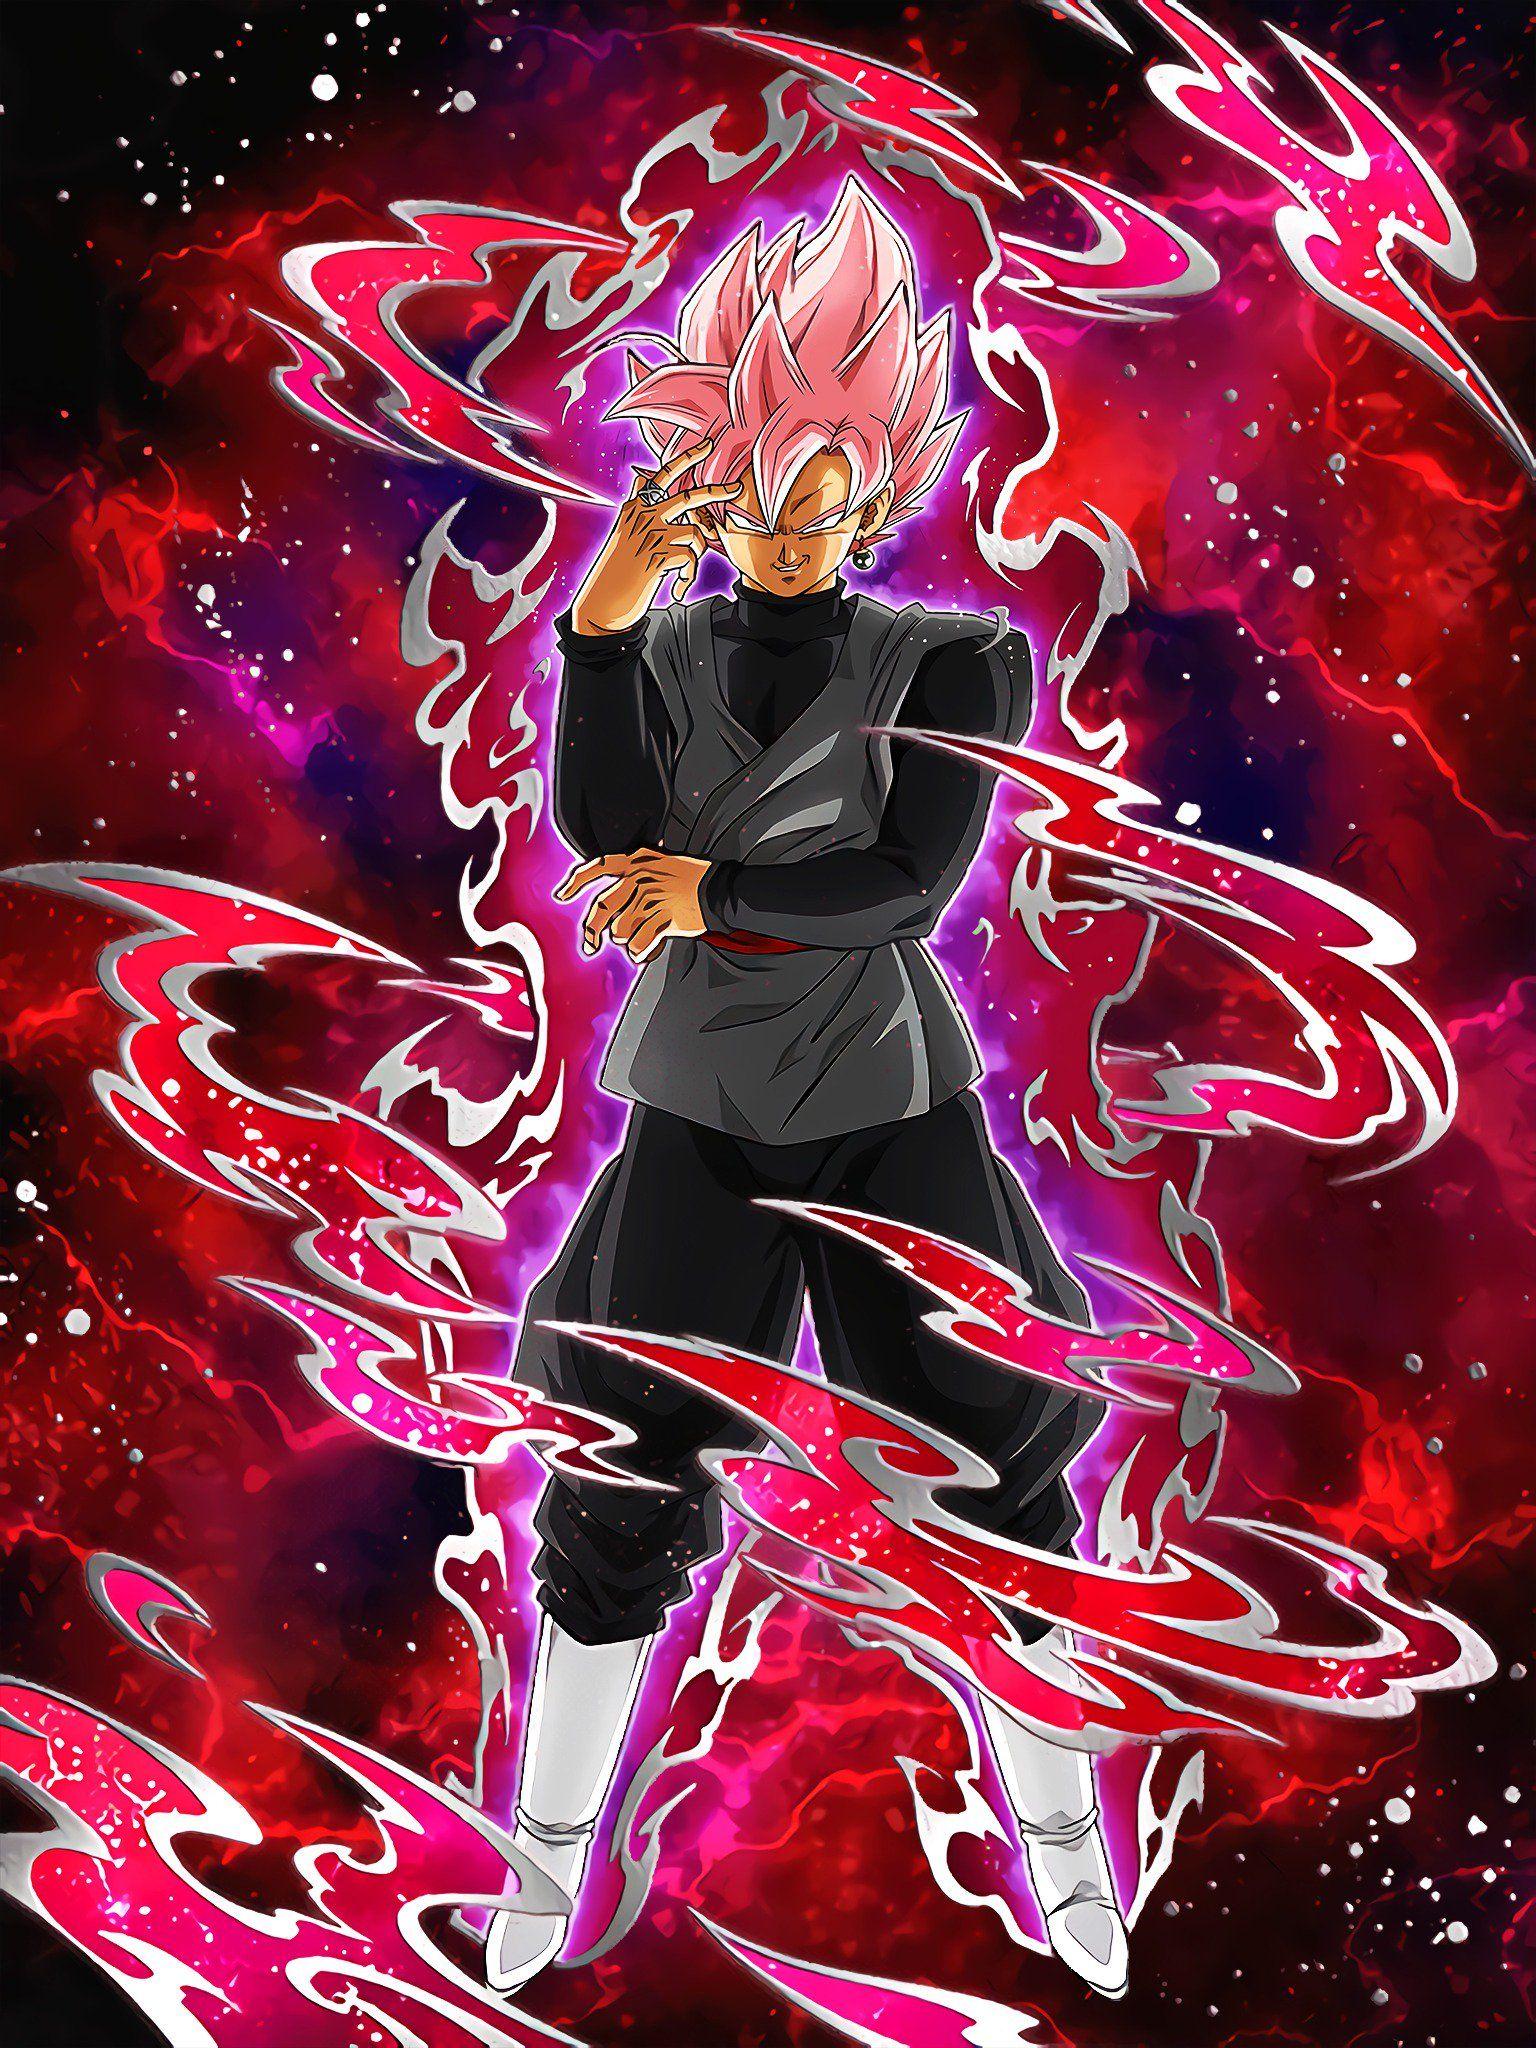 Beautiful Domination Goku Black Super Saiyan Rose Dragon Ball Super Goku Anime Dragon Ball Super Dragon Ball Super Manga